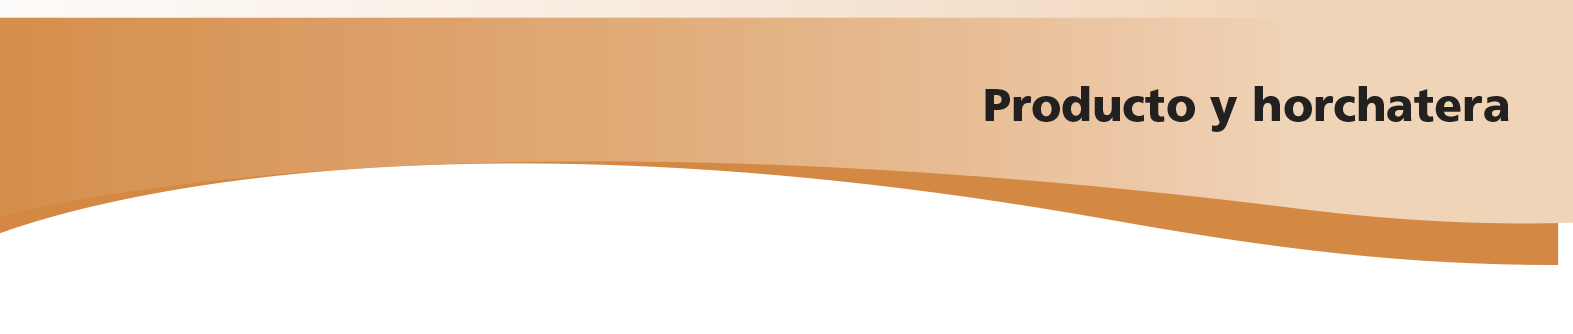 producto-y-horchatera